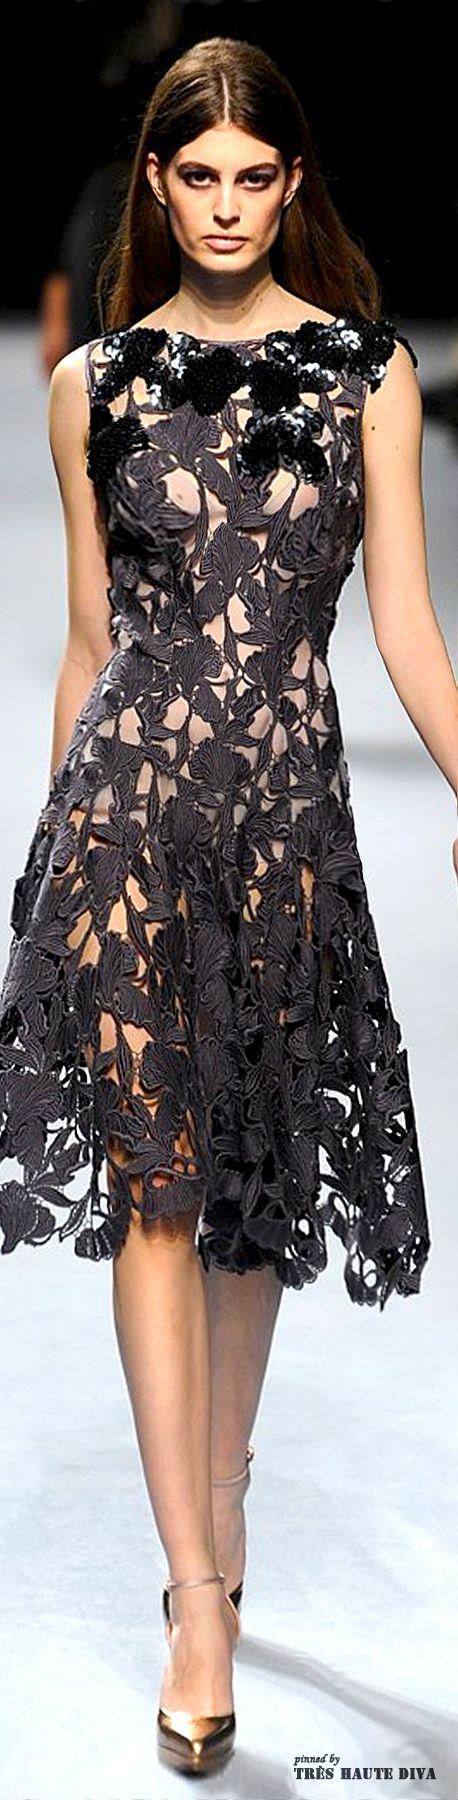 #Paris Fashion Week #Nina Ricci Fall 2014 RTW